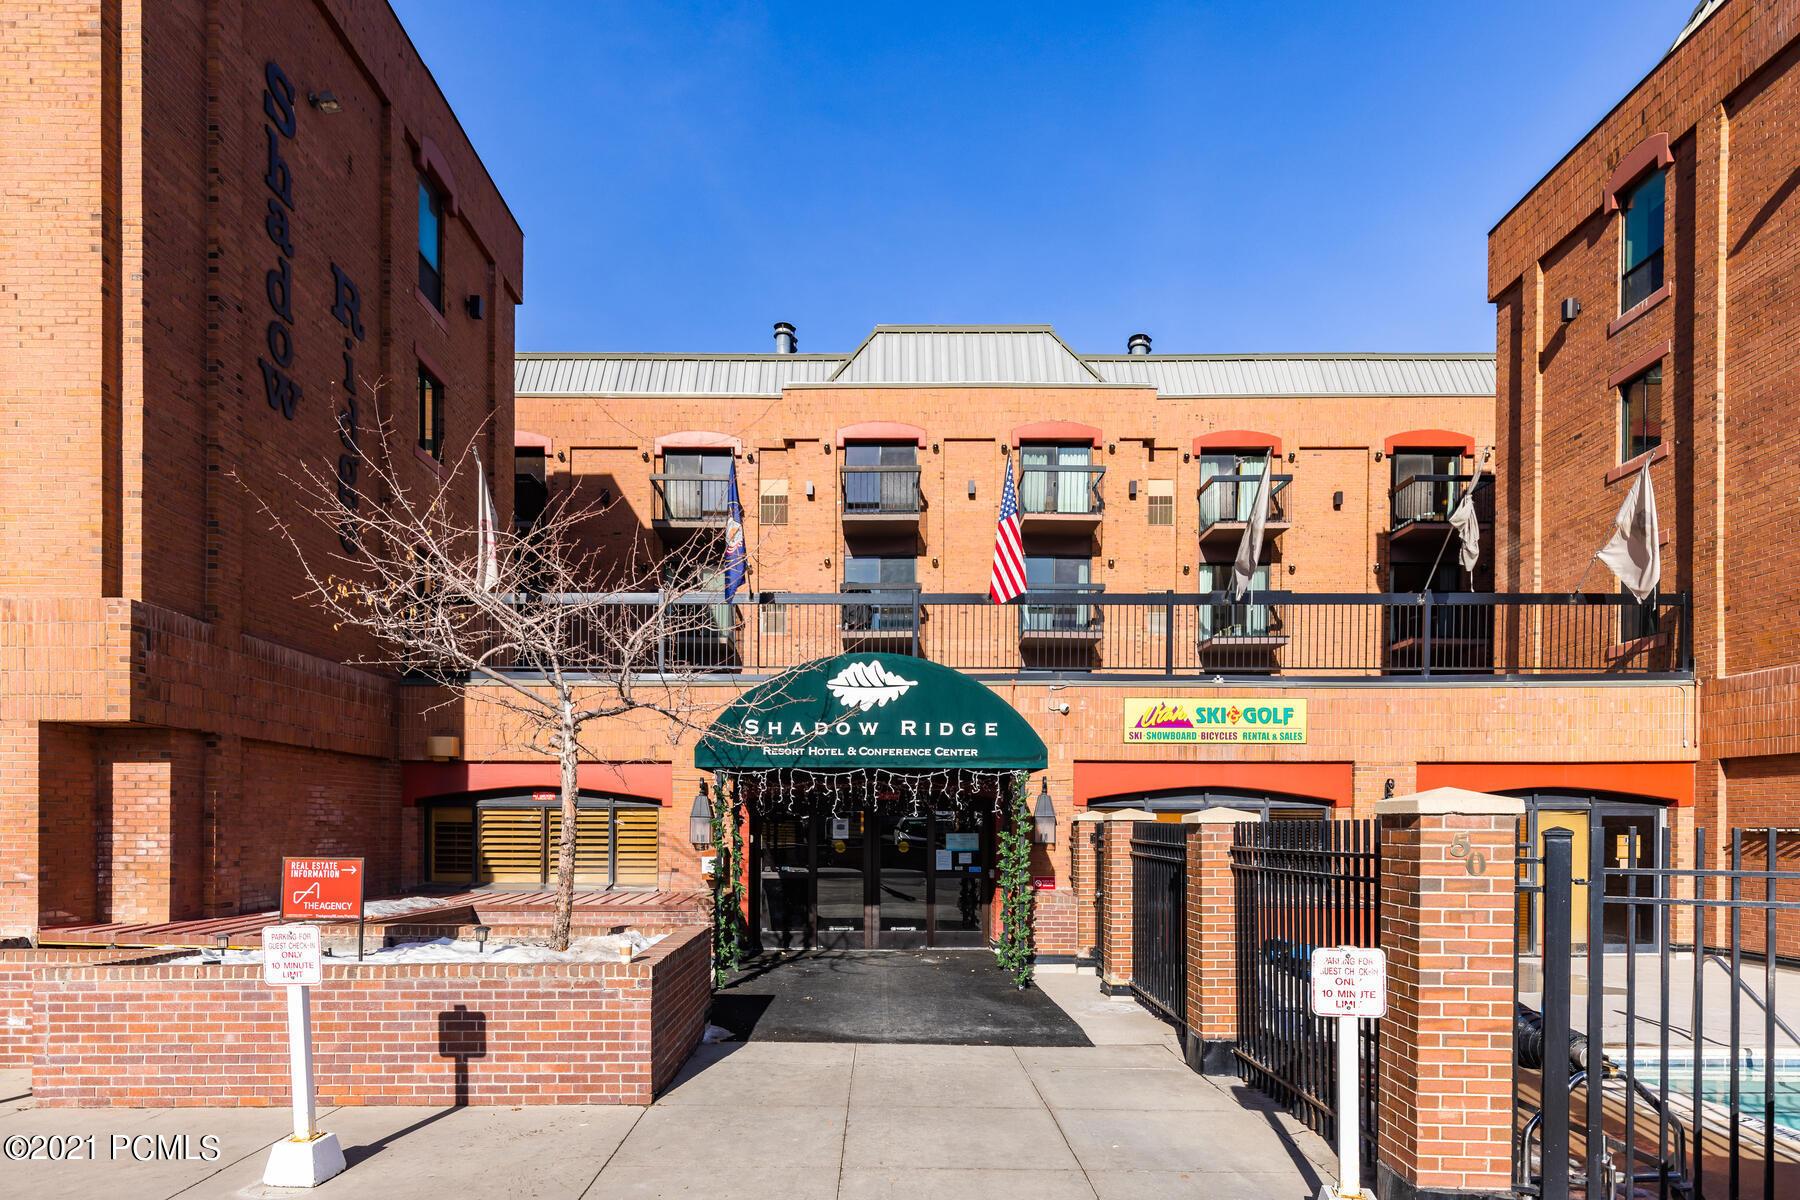 50 Shadow Ridge Road, Park City, Utah 84060, 2 Bedrooms Bedrooms, ,3 BathroomsBathrooms,Condominium,For Sale,Shadow Ridge,12100175